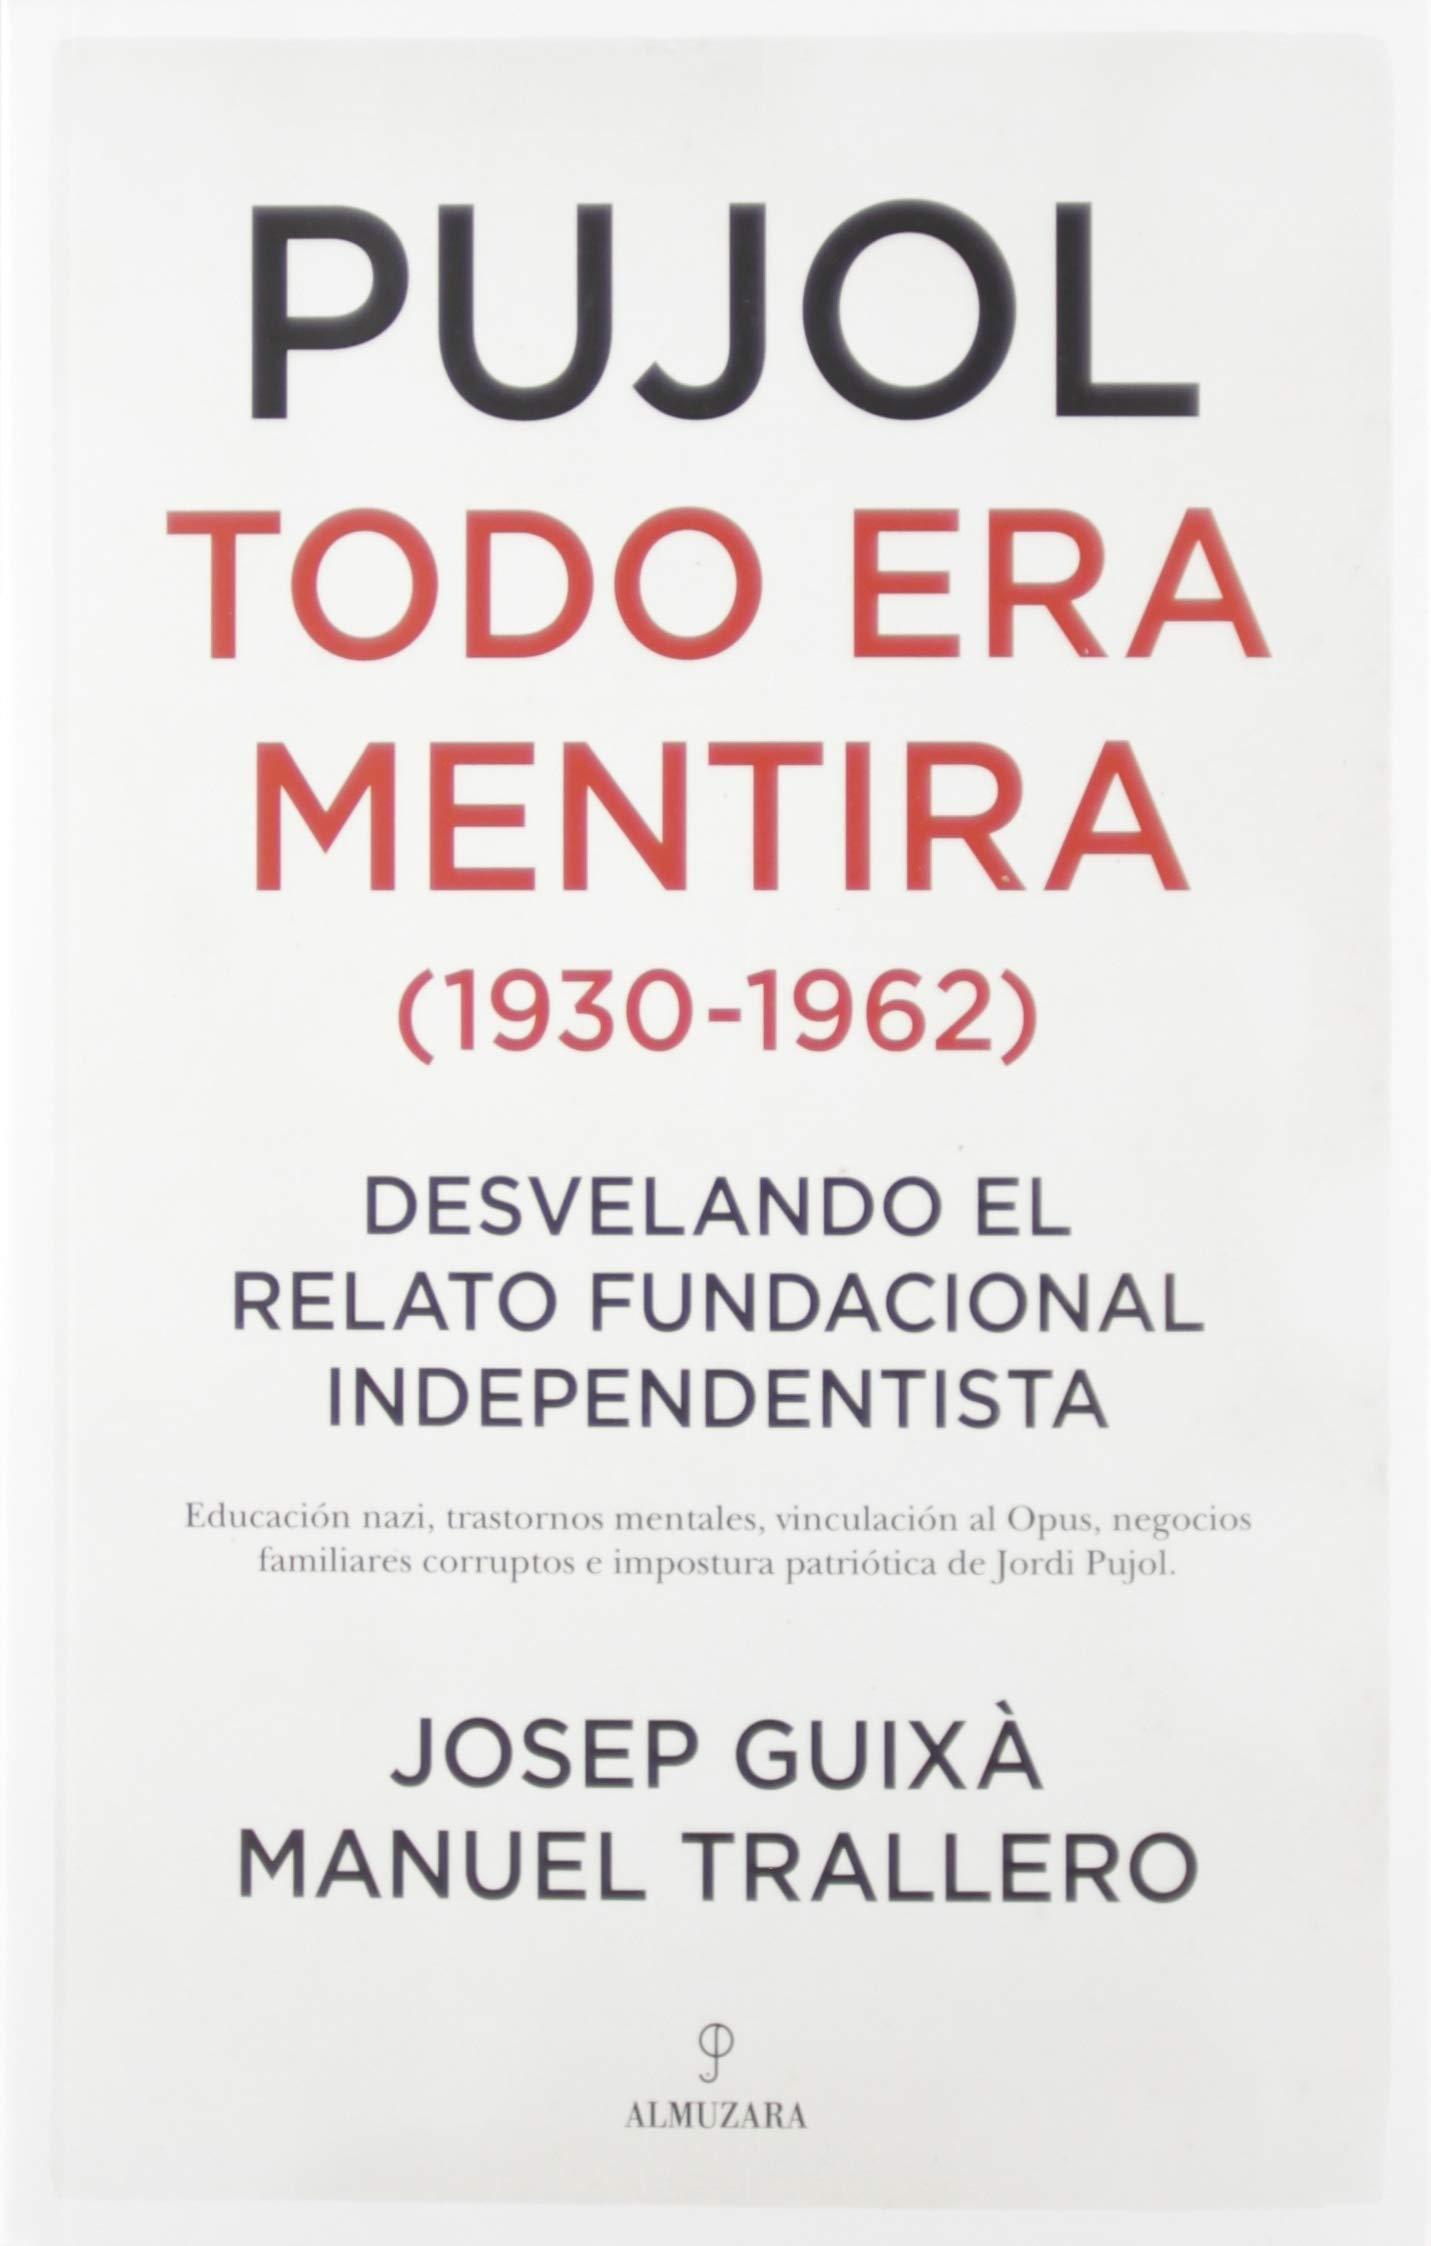 Amazon Fr Pujol Todo Era Mentira 1930 1962 Desvelando El Relato Fundacional Independentista Guixa Cerdà Josep Trallero De Arriba Manuel Livres